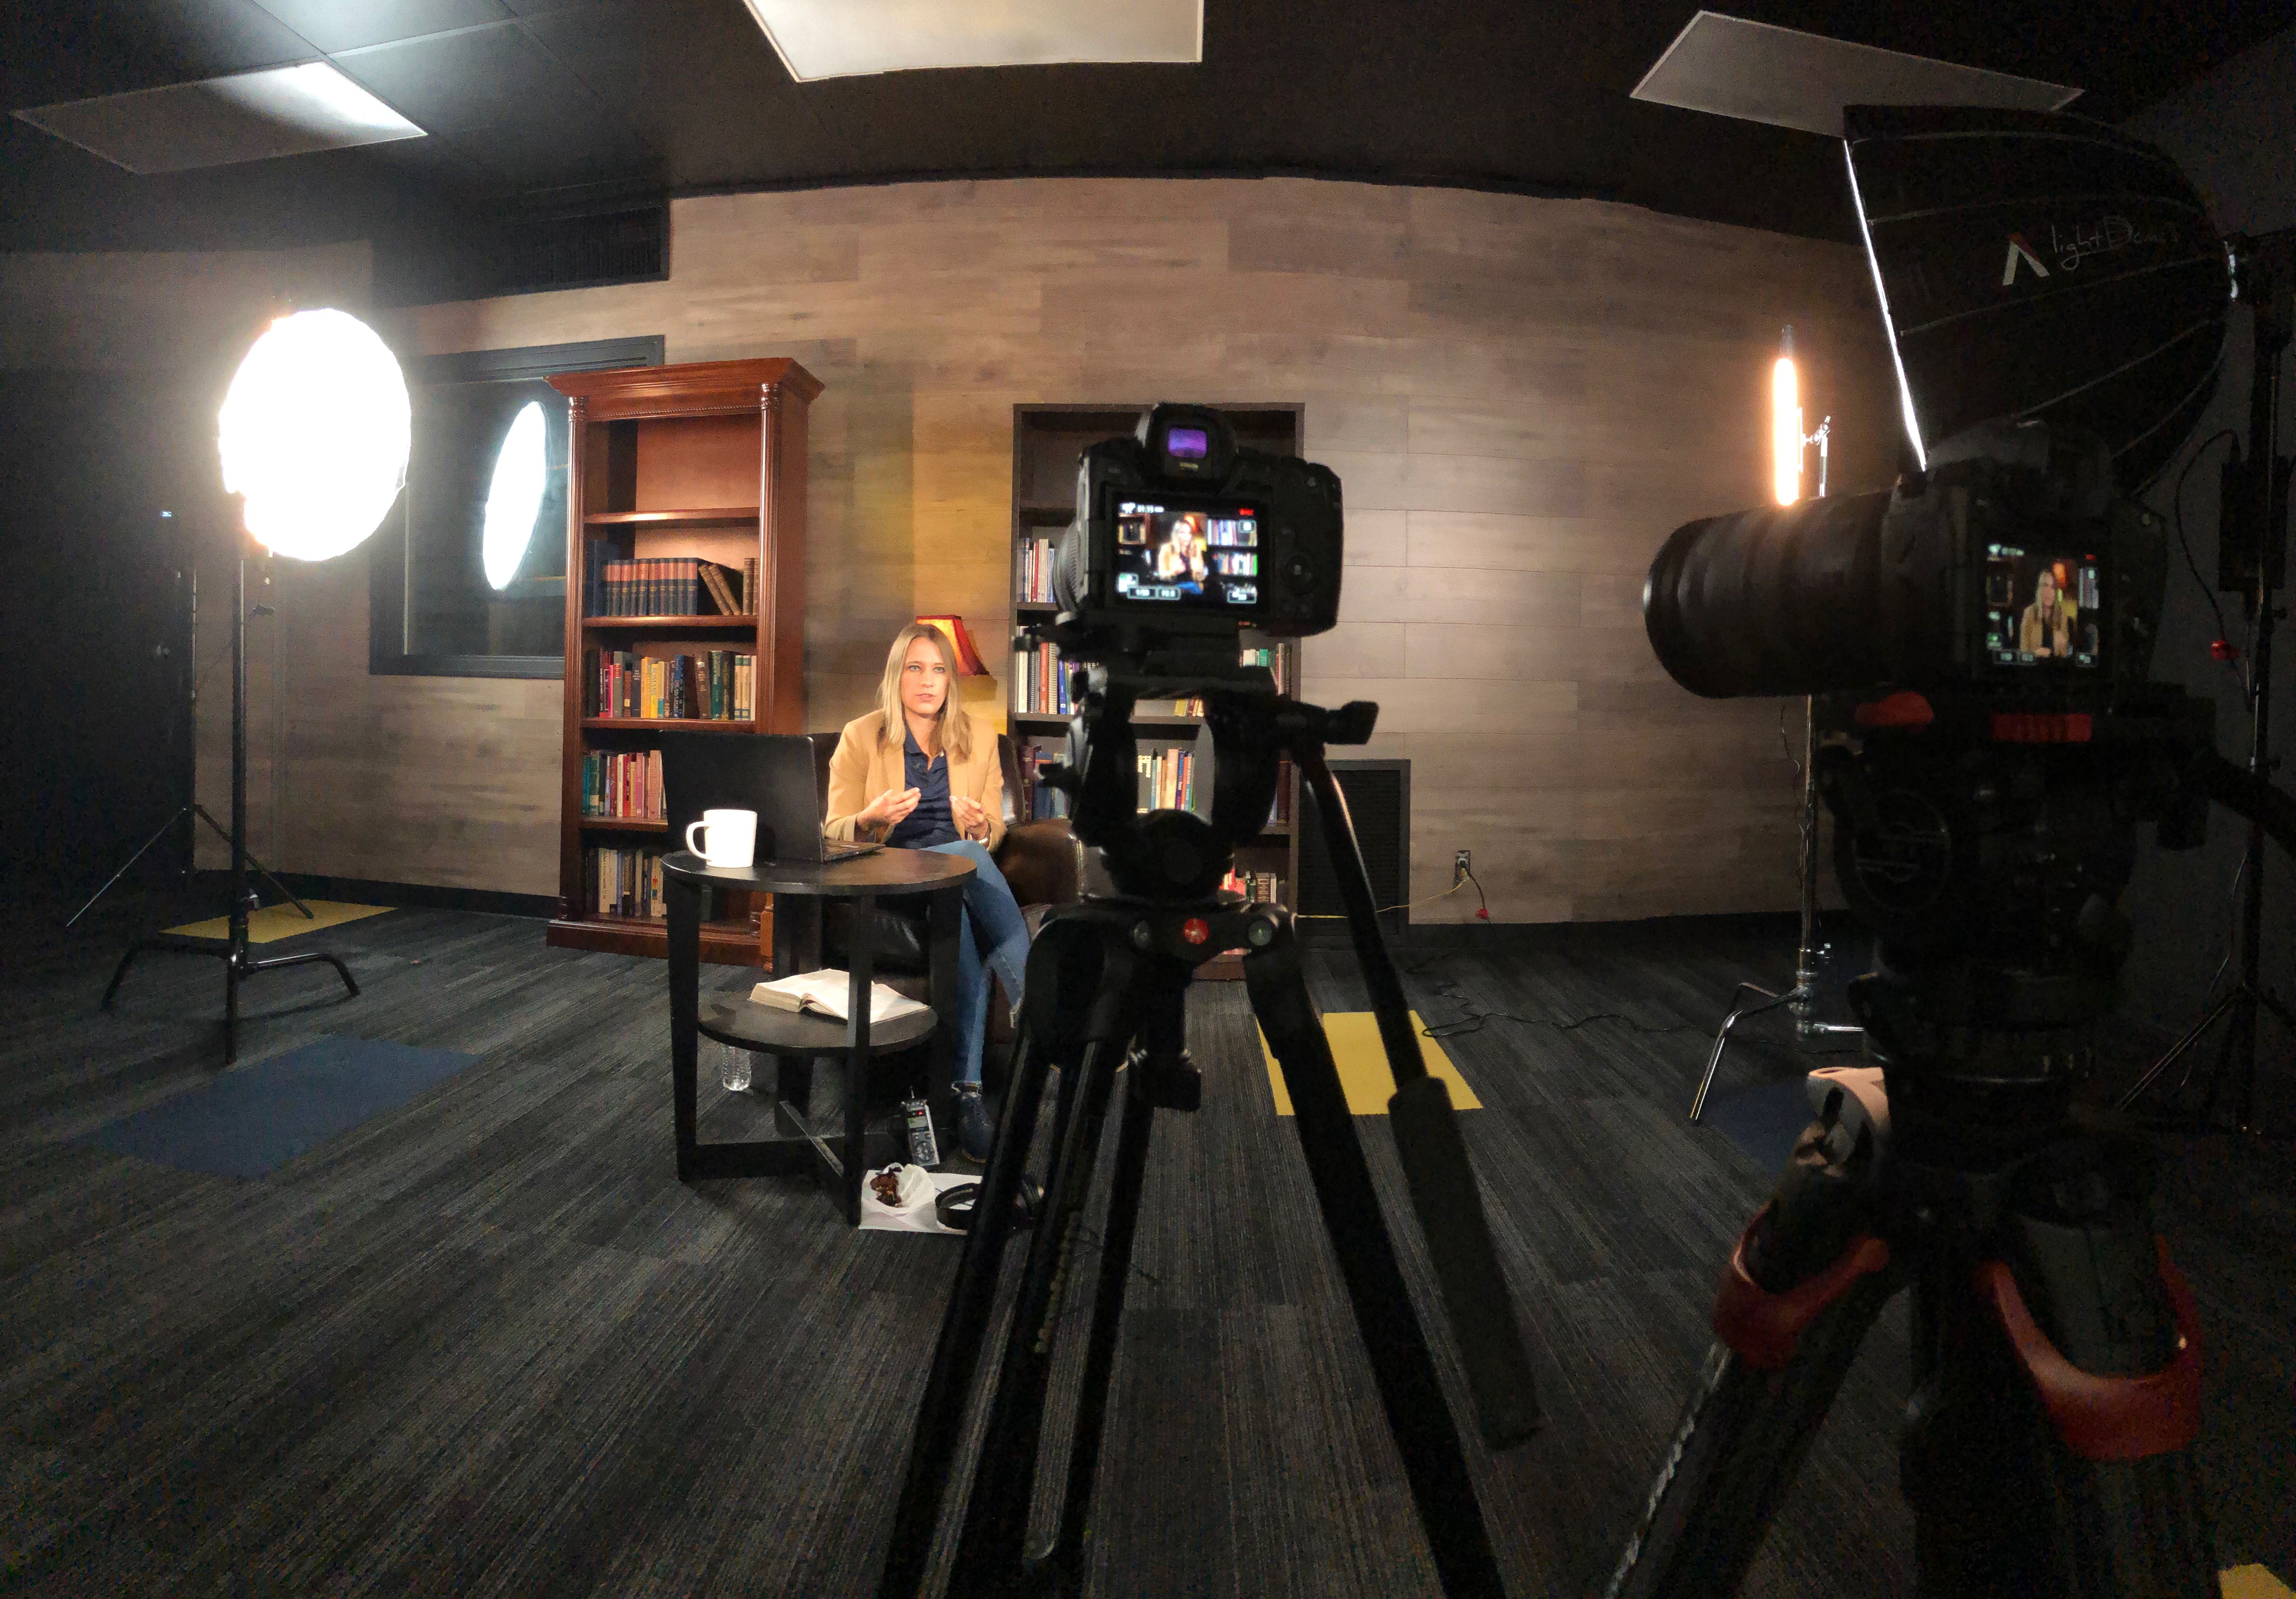 Professer Lucia Sanders filming certificate course in studio for LPU